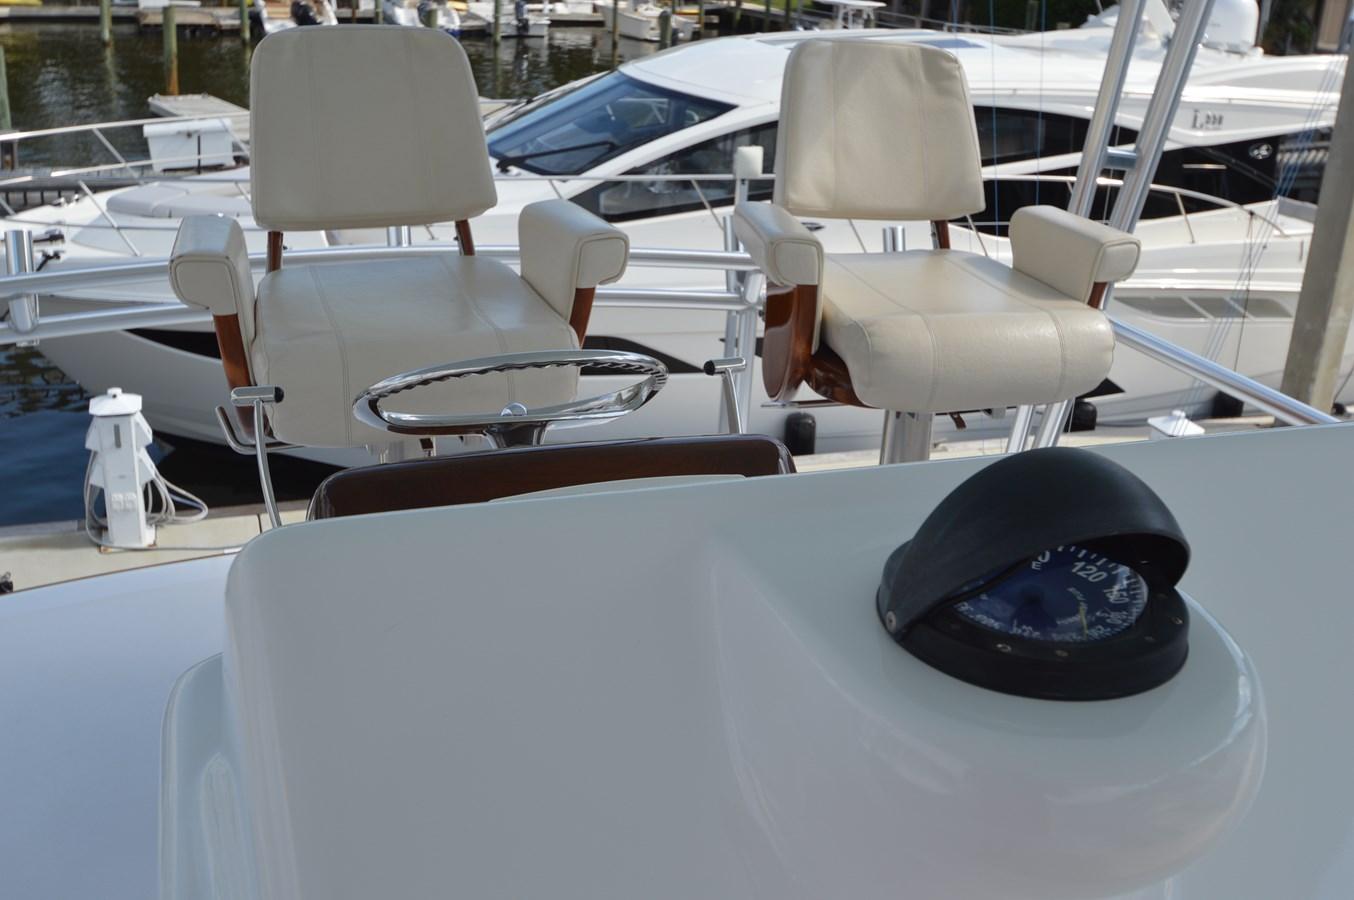 2010 64 Jarrett Bay Boatworks Convertible - 64 JARRETT BAY For Sale